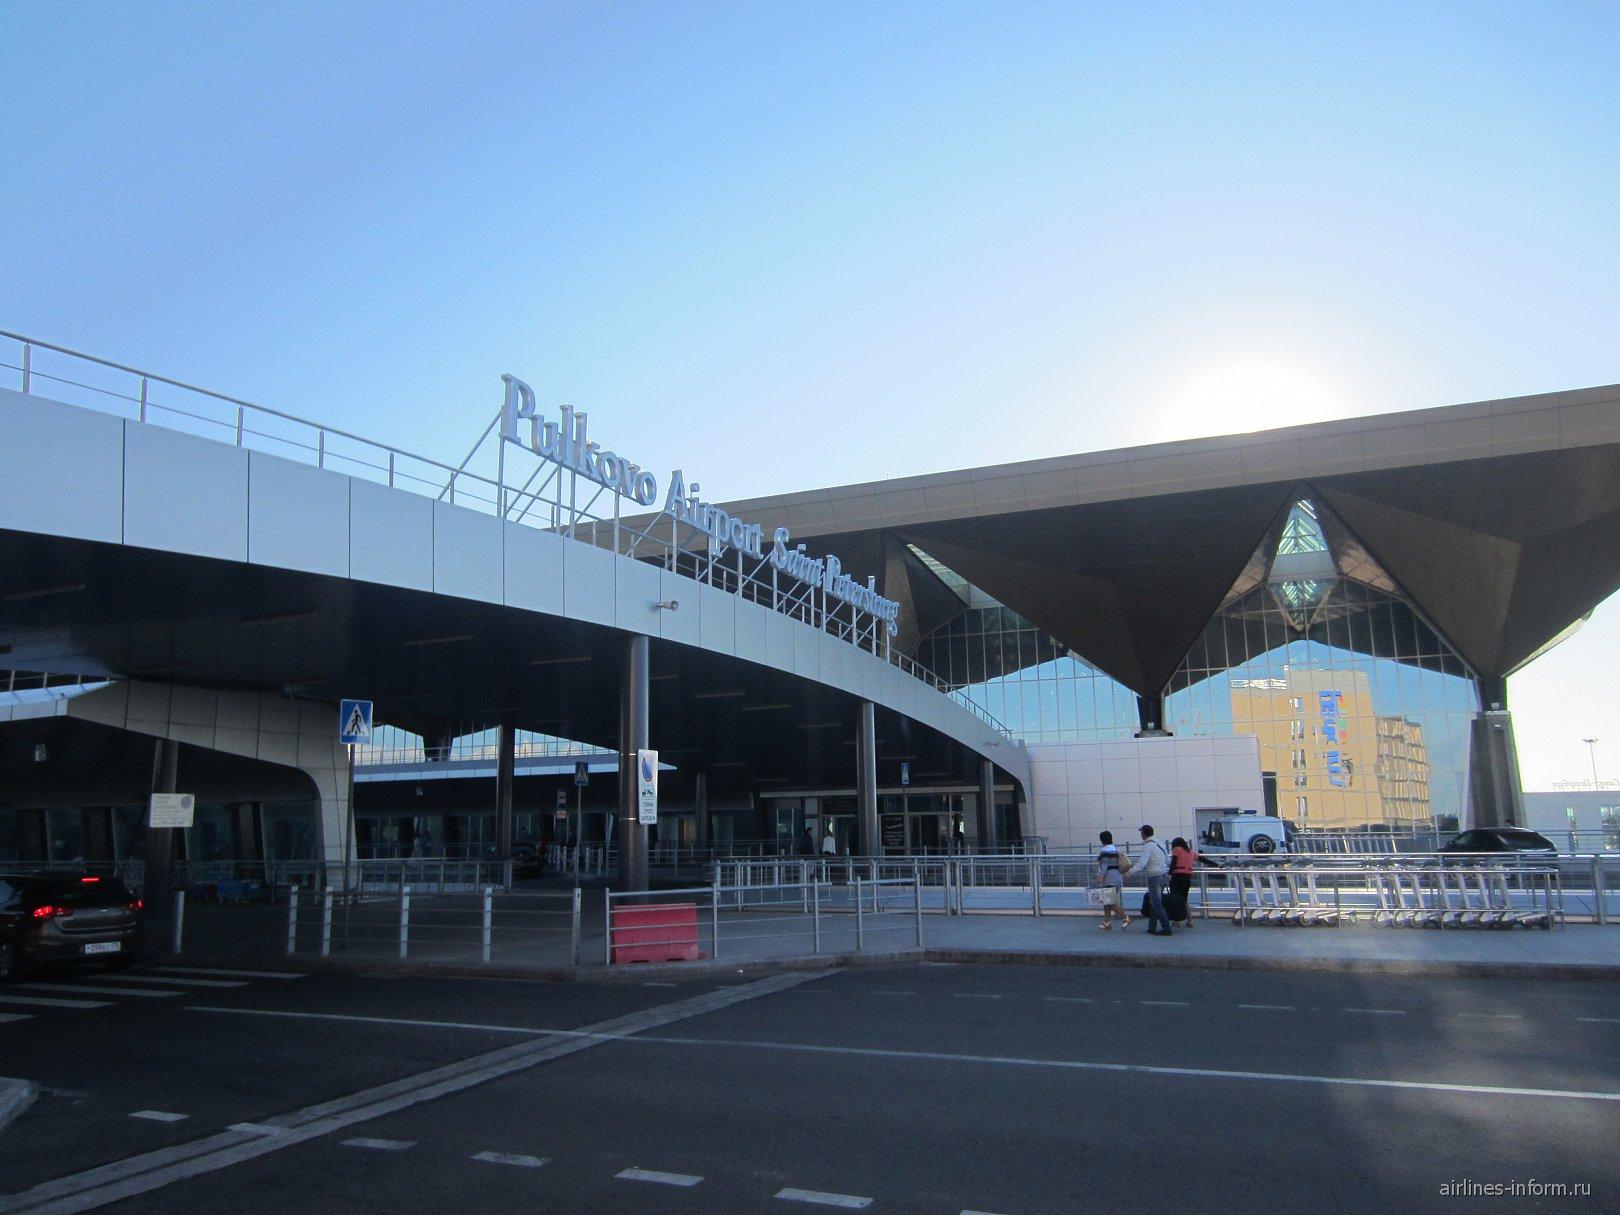 Вход в пассажирский терминал аэропорта Пулково